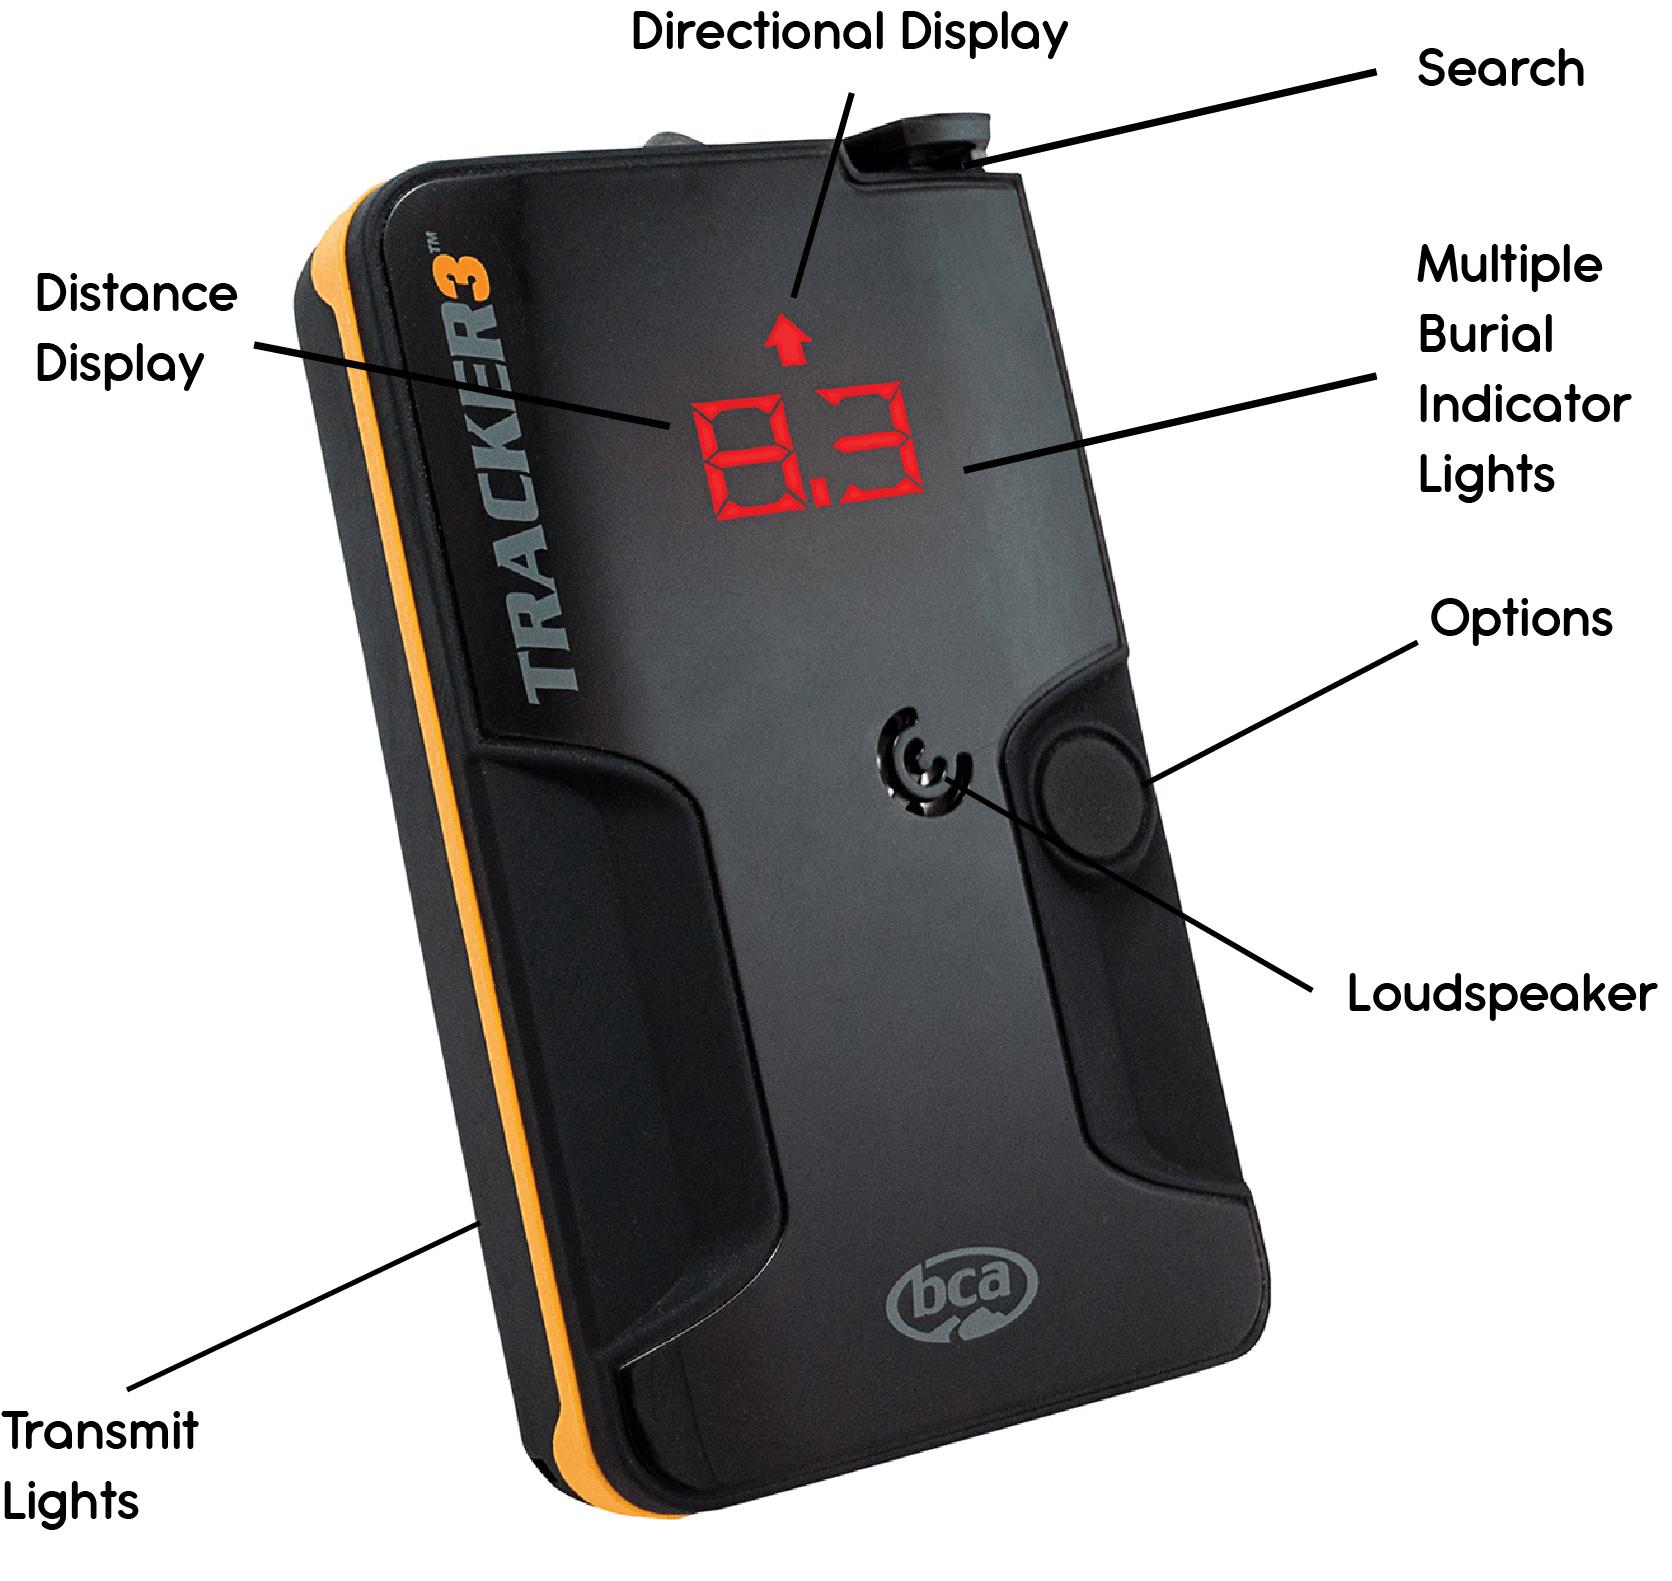 BCA Tracker 3 Features